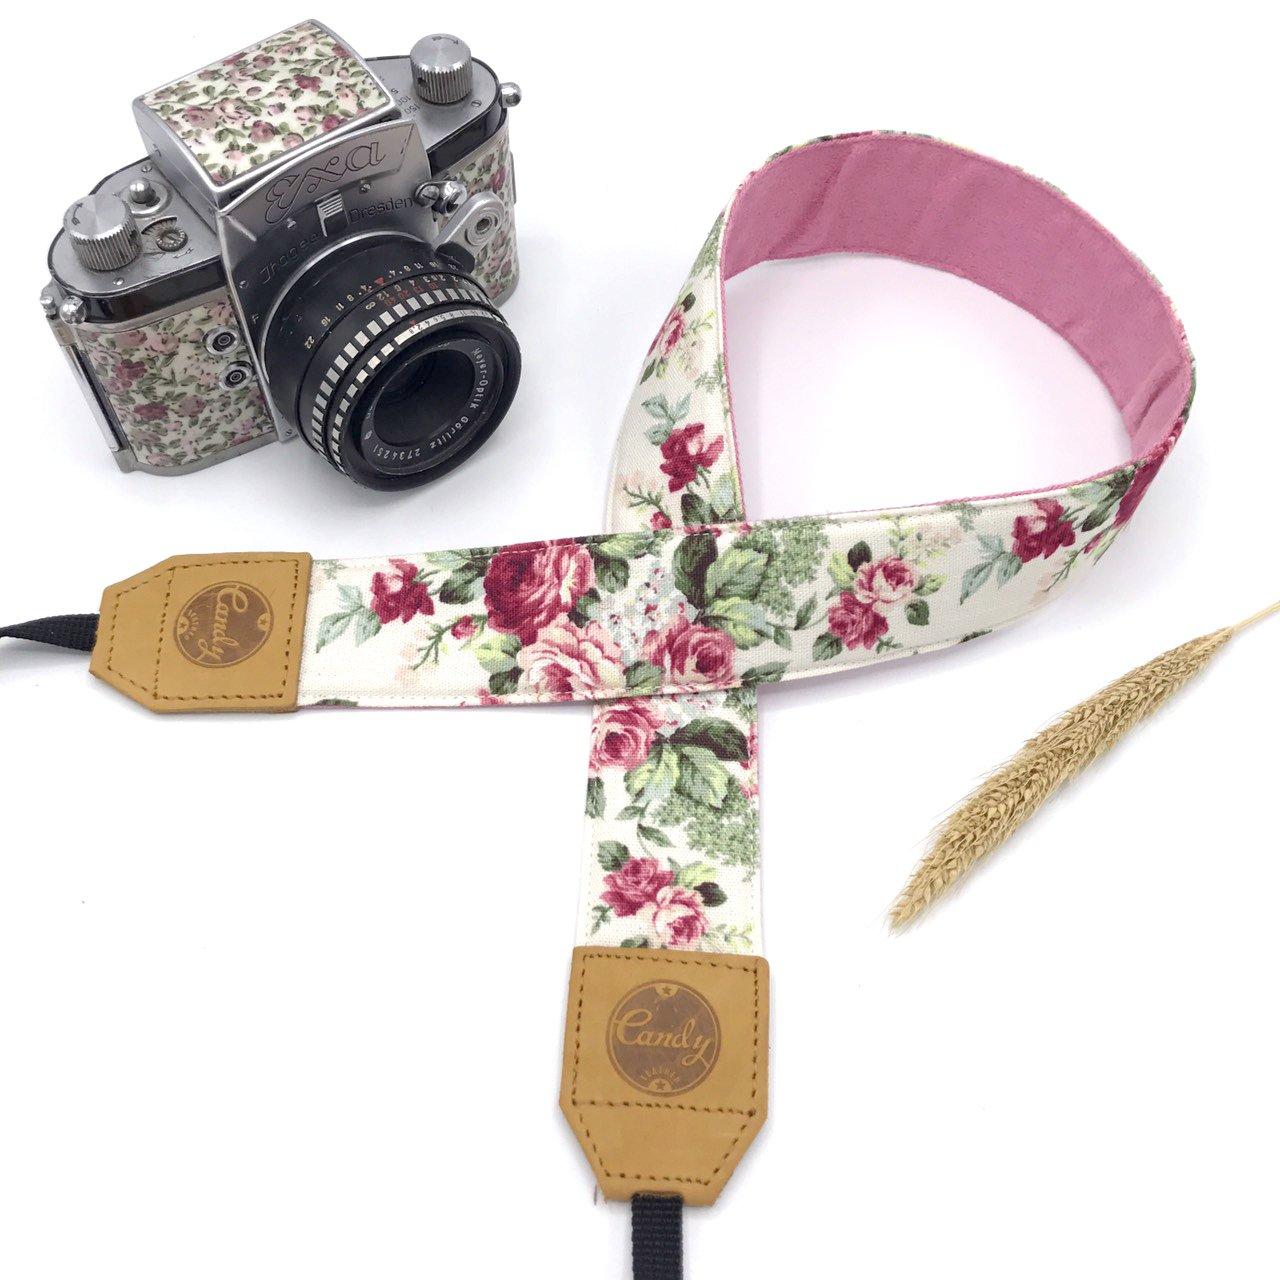 PresonalizedホワイトピンクFloraカメラストラップ、キャンディレザーDSLRカメラストラップ、本革カメラストラップ、ギフトfor Her B07DPSK4JY